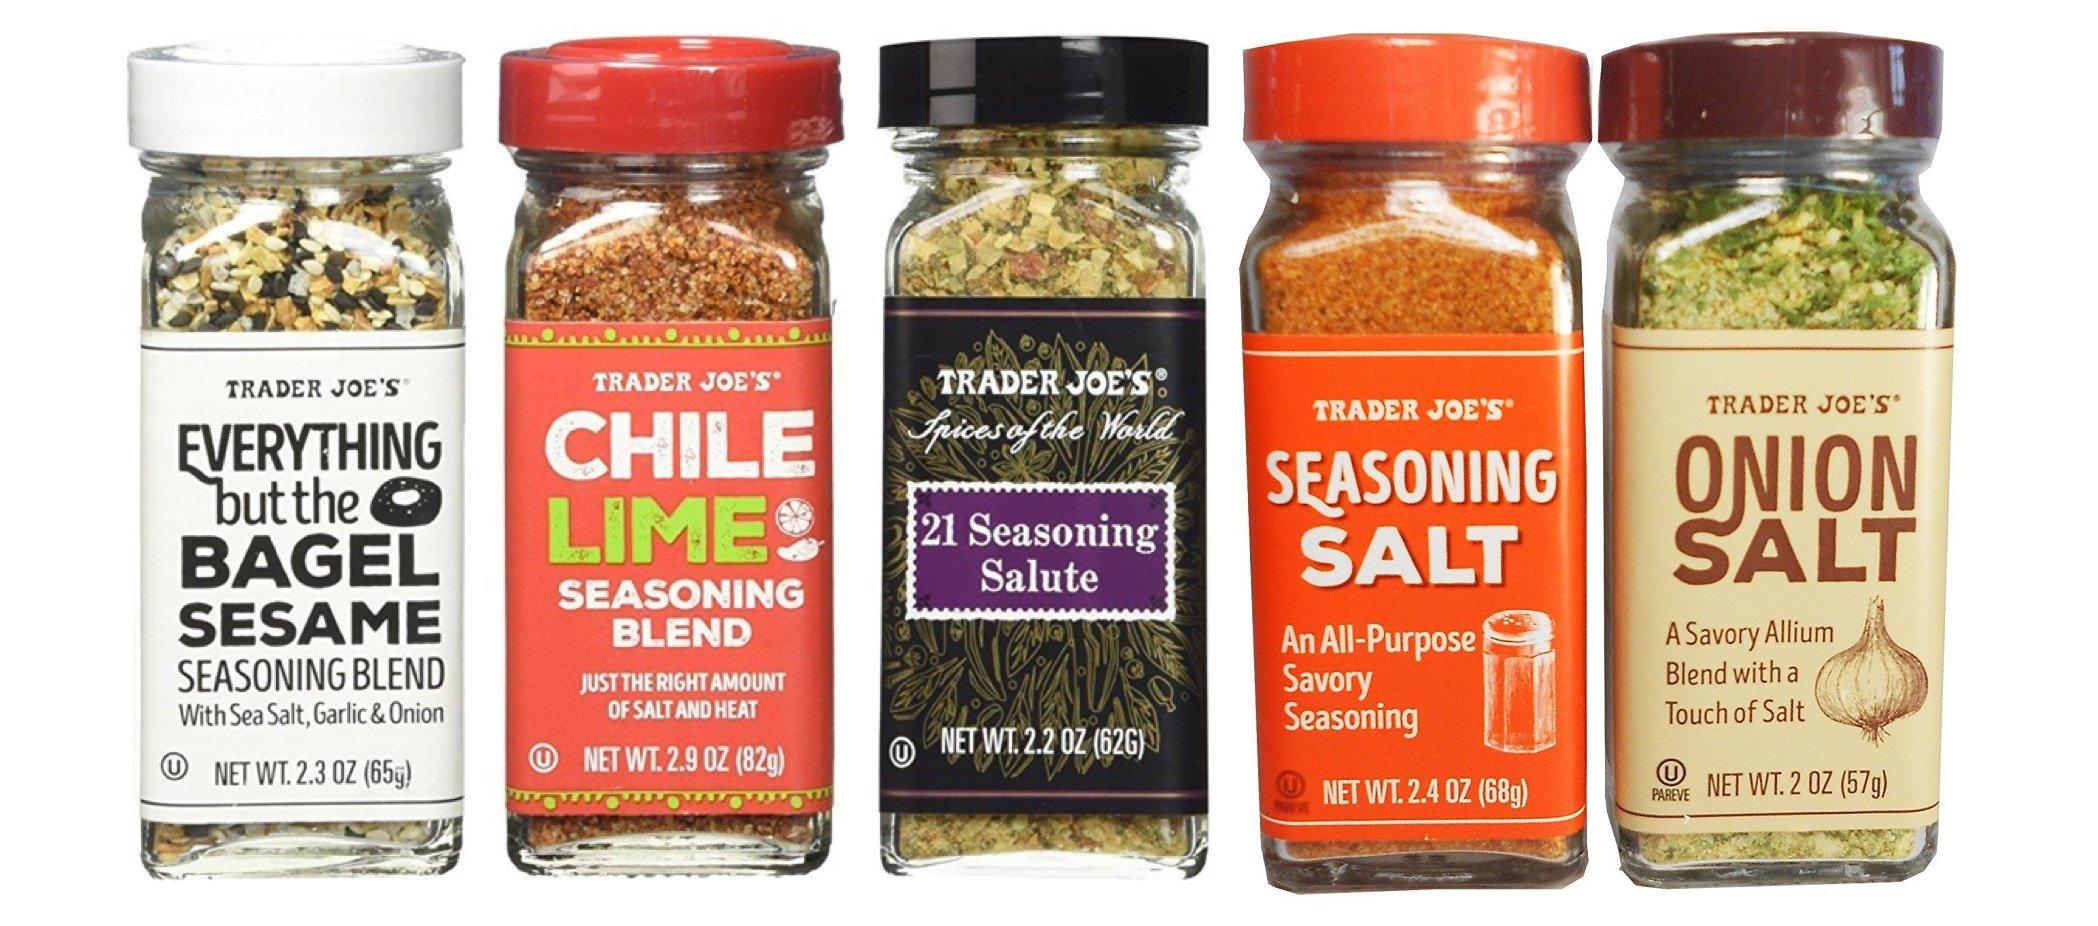 Trader Joe's Seasoning - 21 Salute Seasoing, Chile Lime,Seasoning Salt, Onion Salt and Everything but the bagel Seasoning